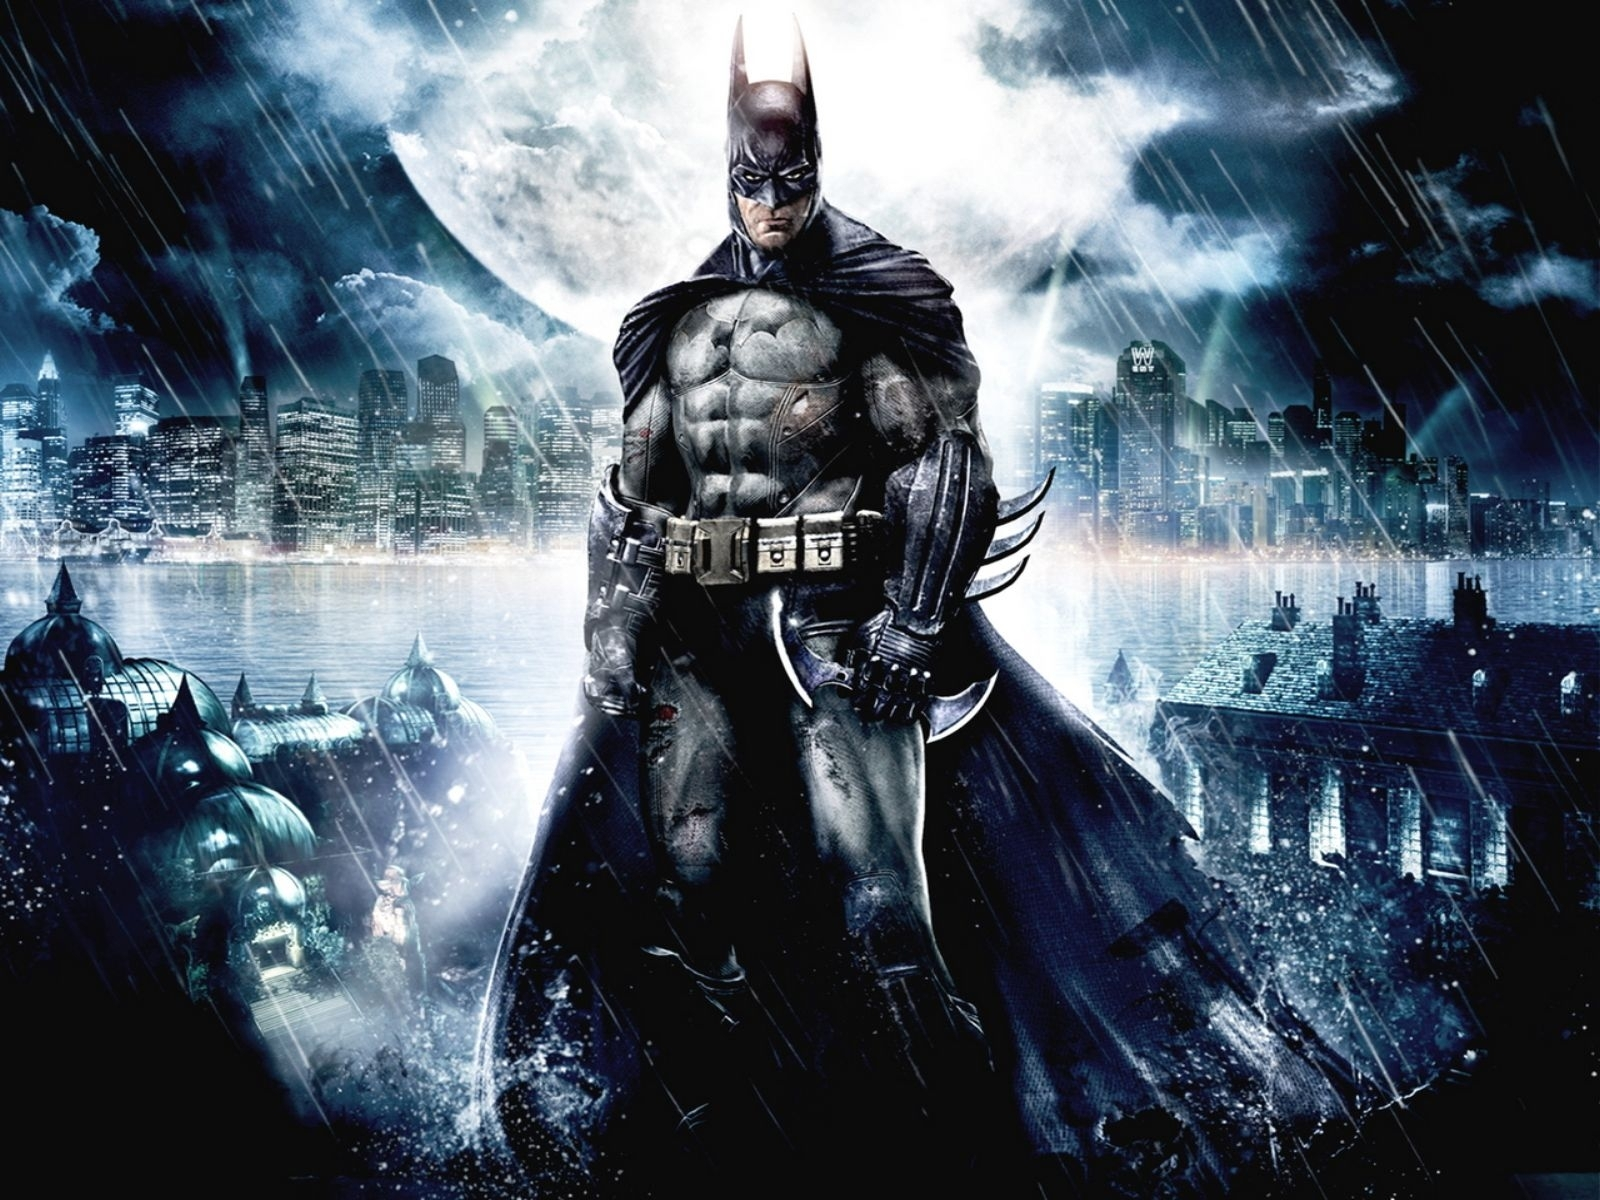 Hd wallpaper batman - The Best Batman Wallpaper Ever Batman Wallpapers